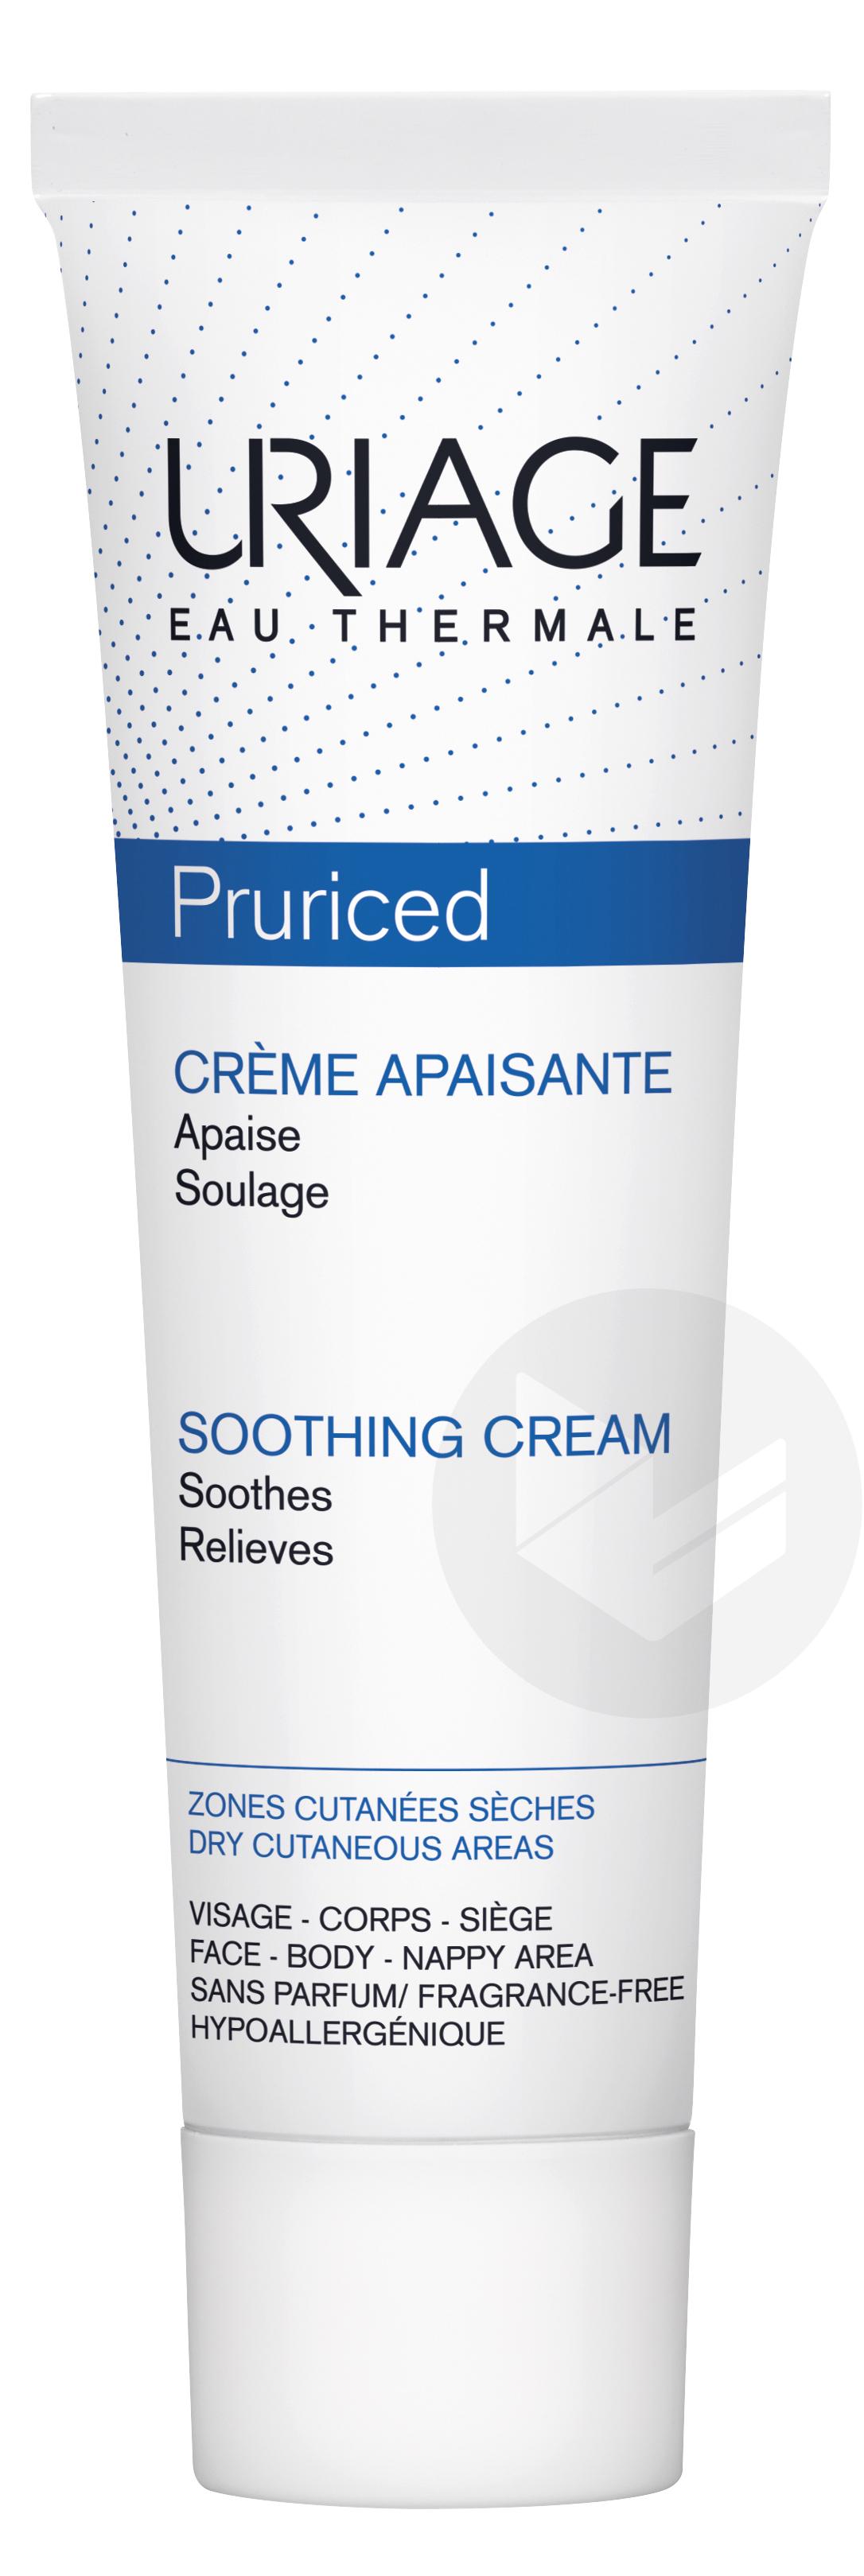 Pruriced Crème 100ml